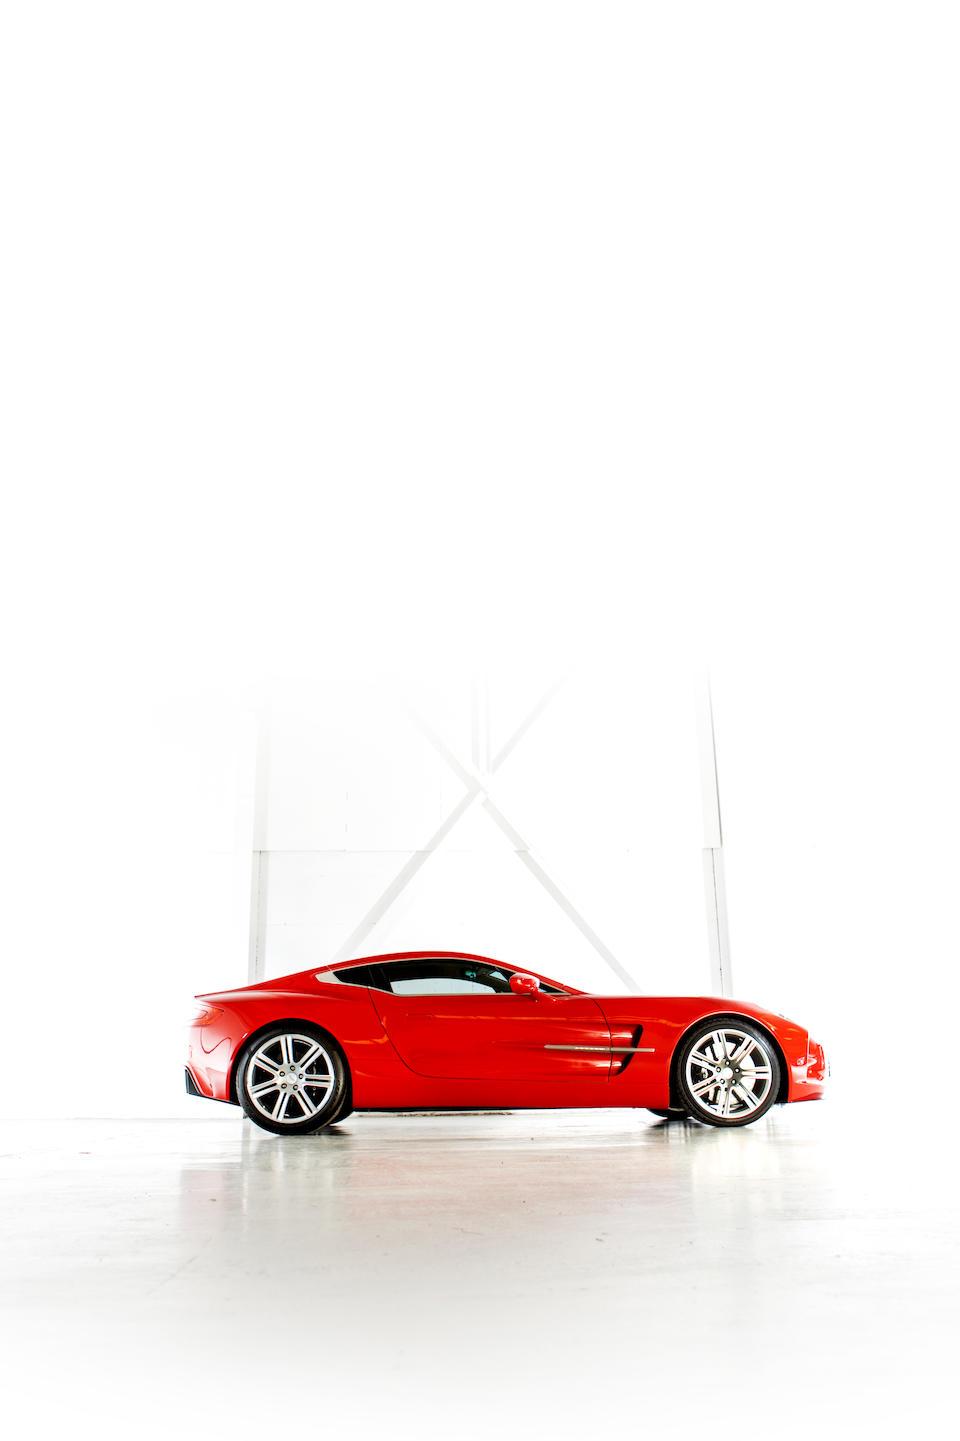 2011 Aston Martin  One-77 Coupé  Chassis no. SCFGFXXX6BGS17735